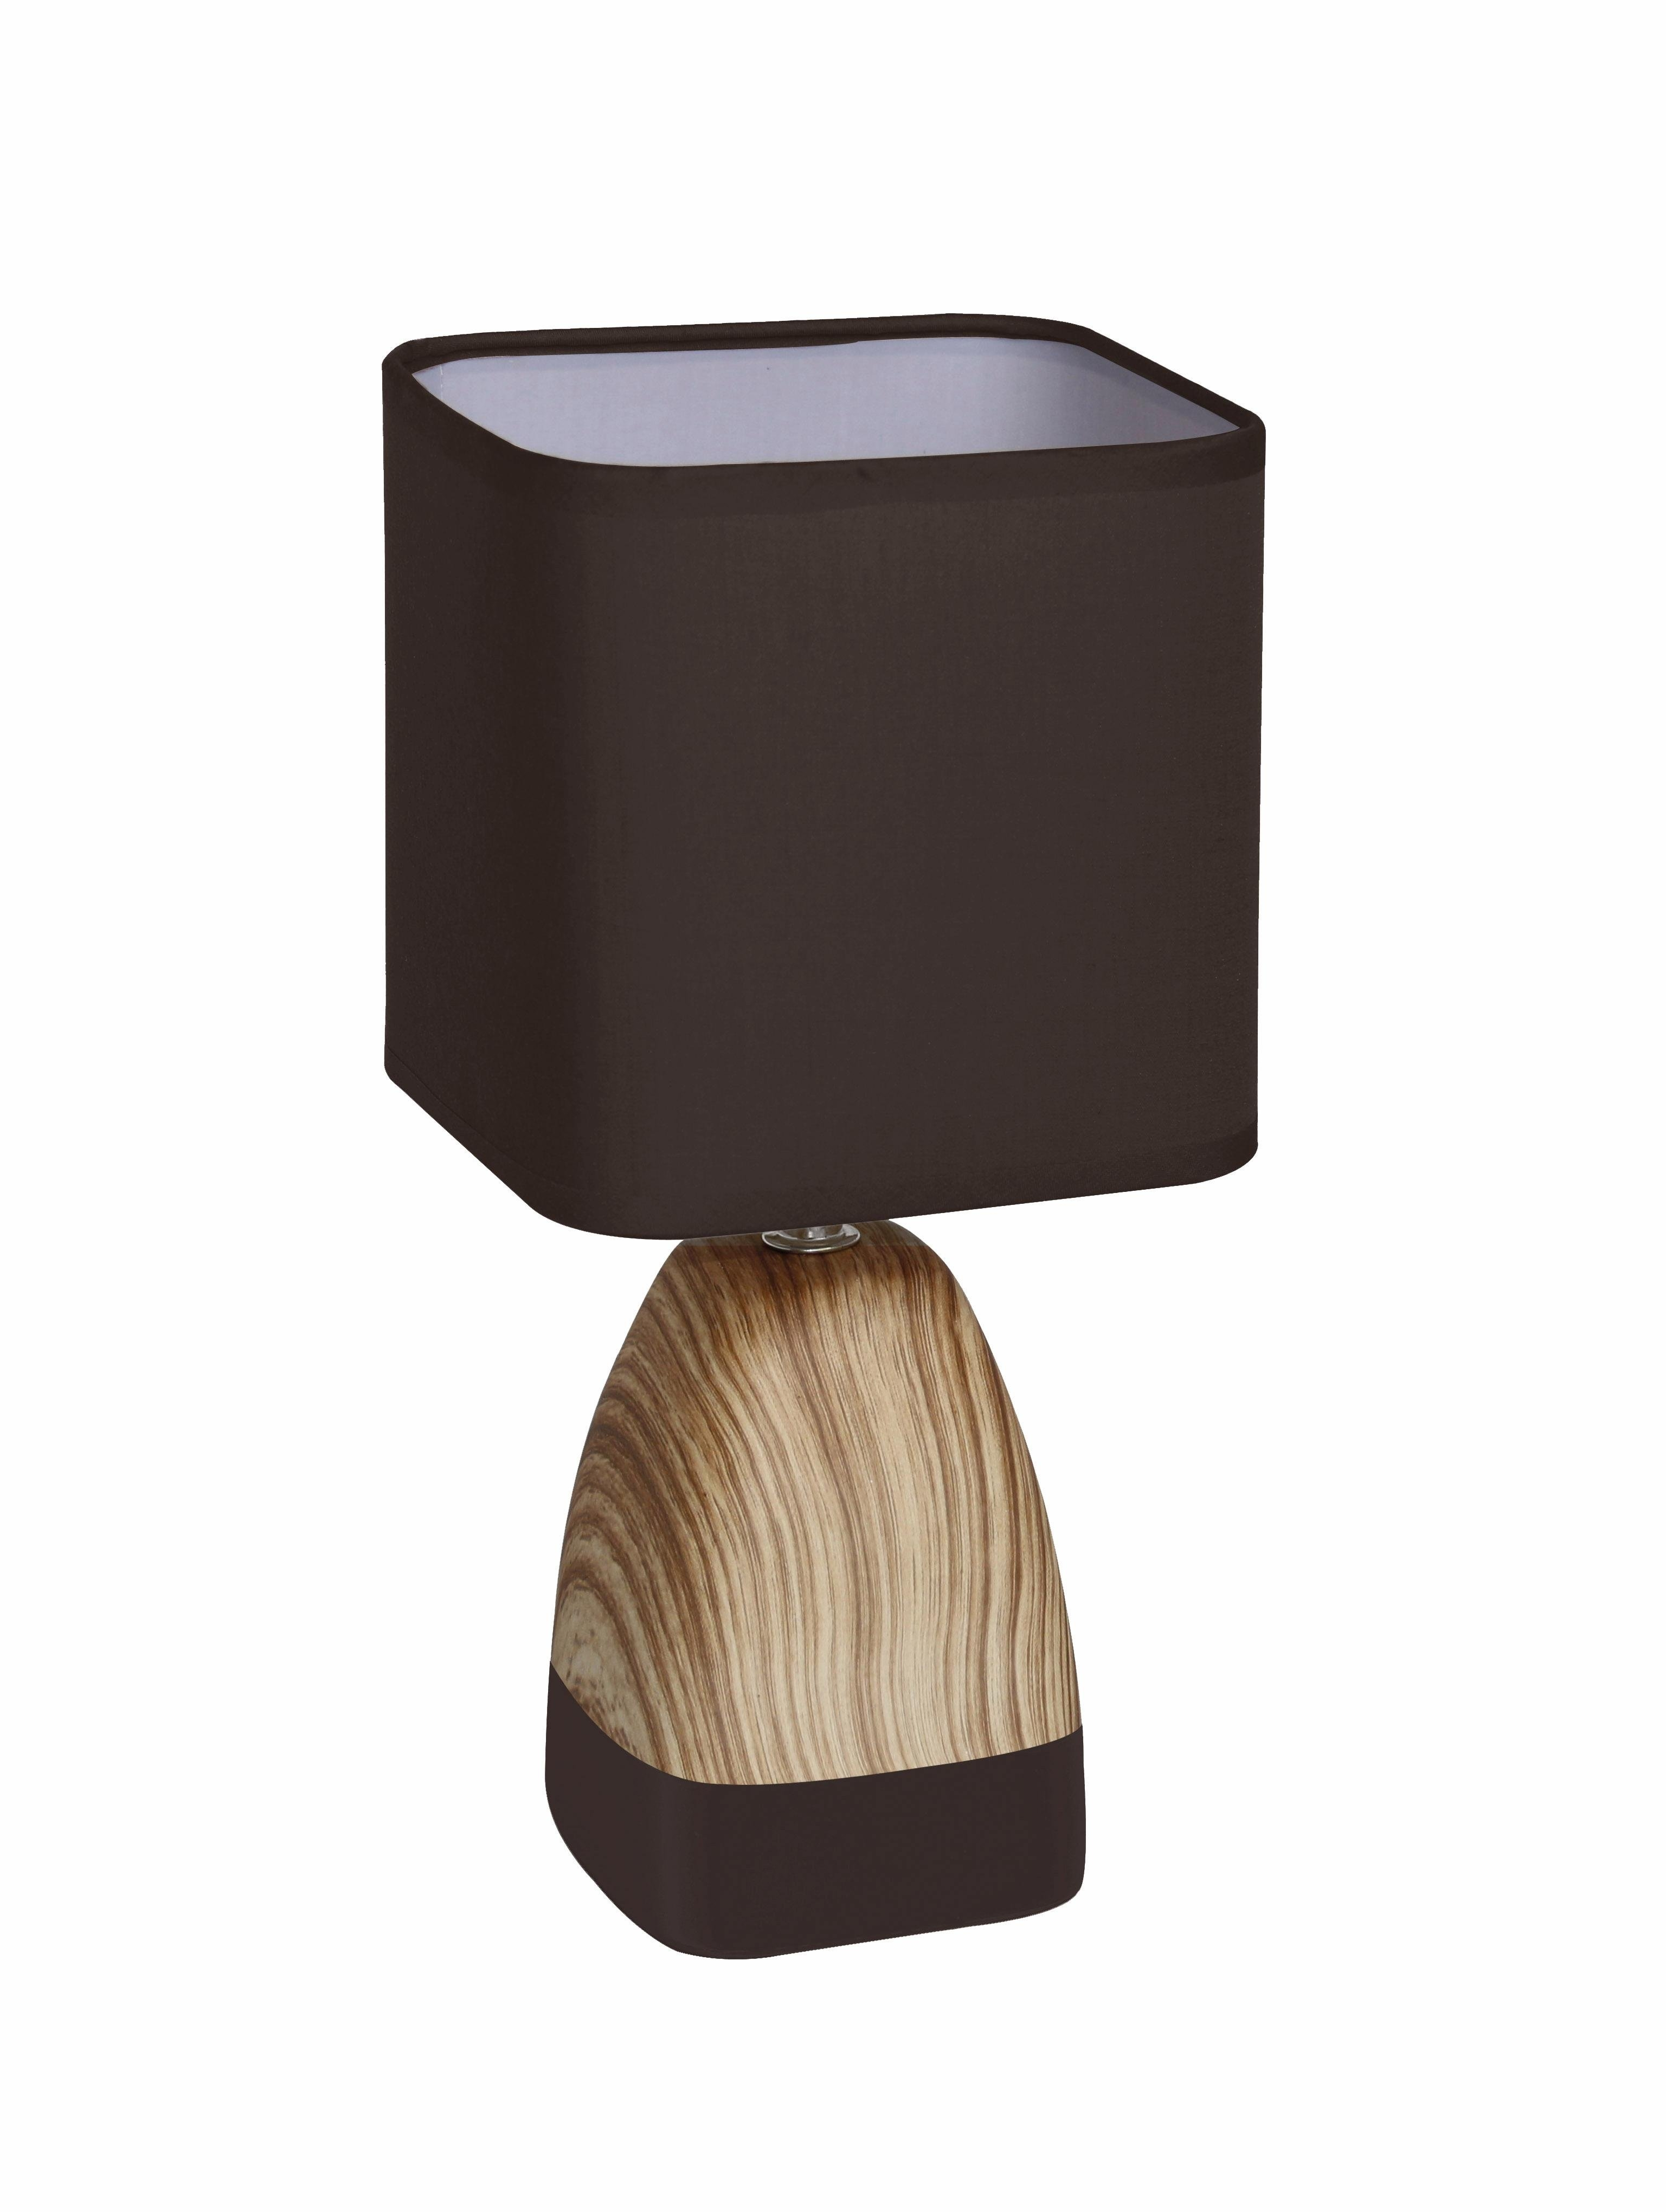 nachtkastlamp kopen grote collectie online otto